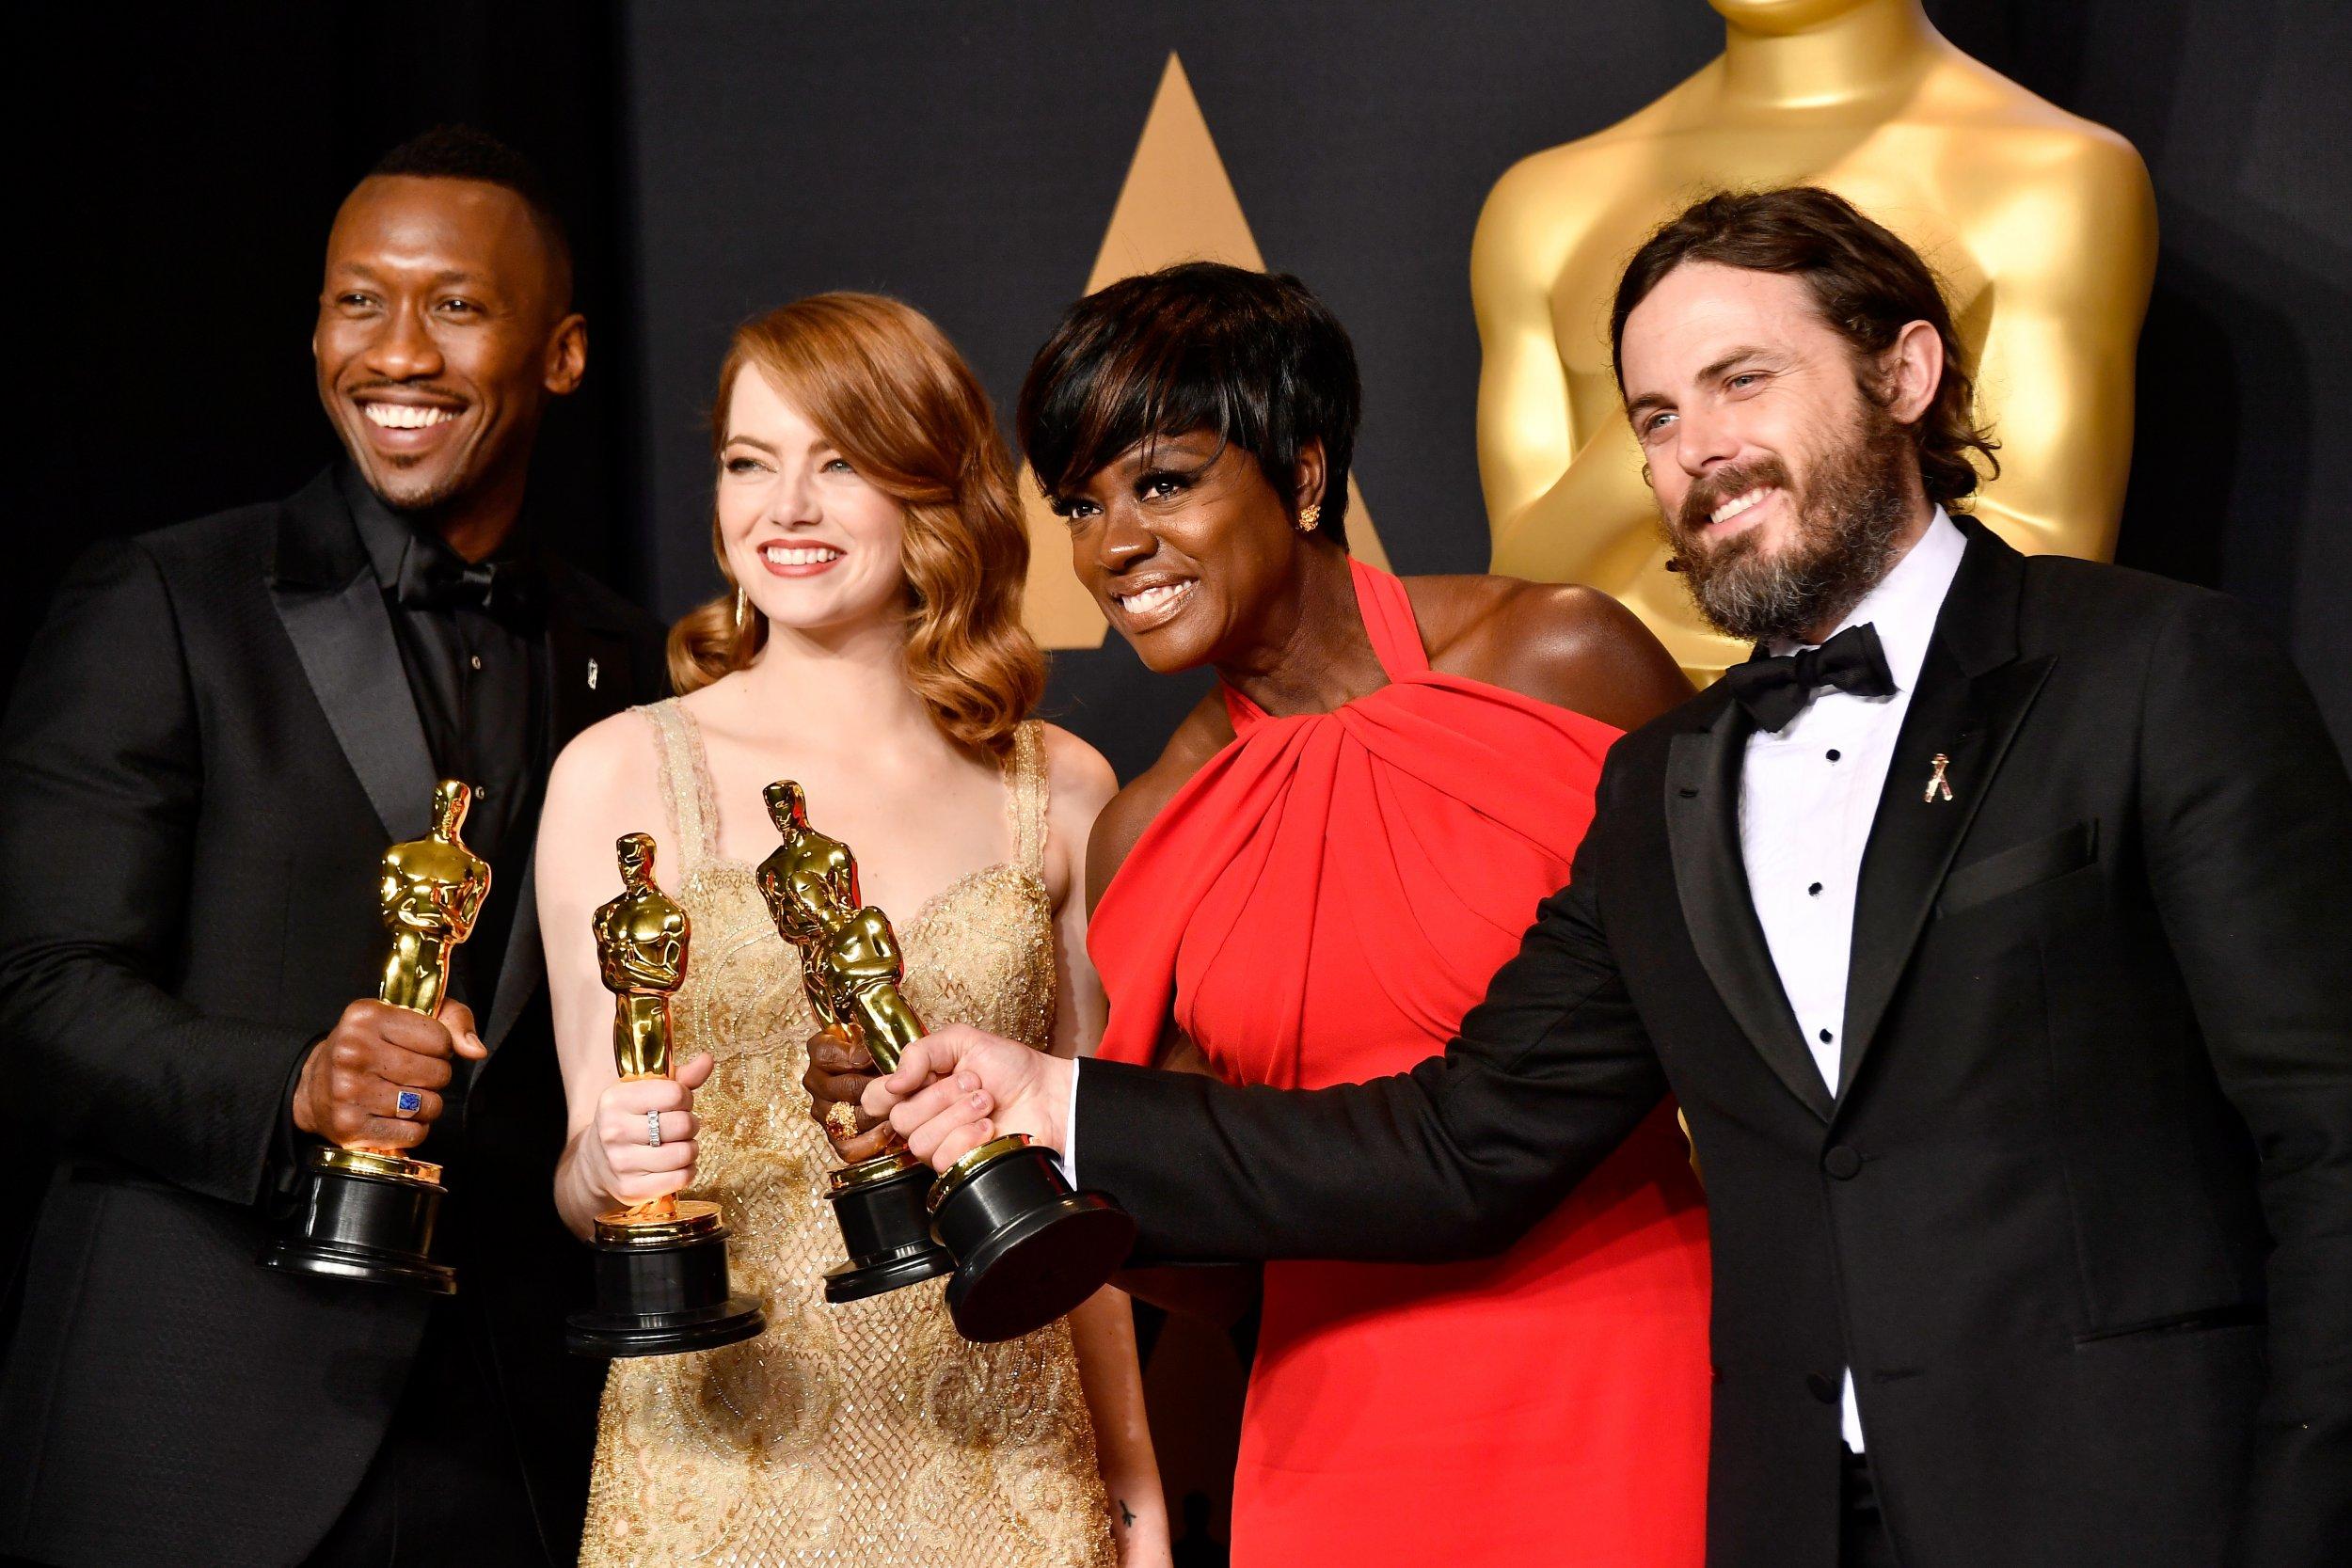 Oscars winner 2017